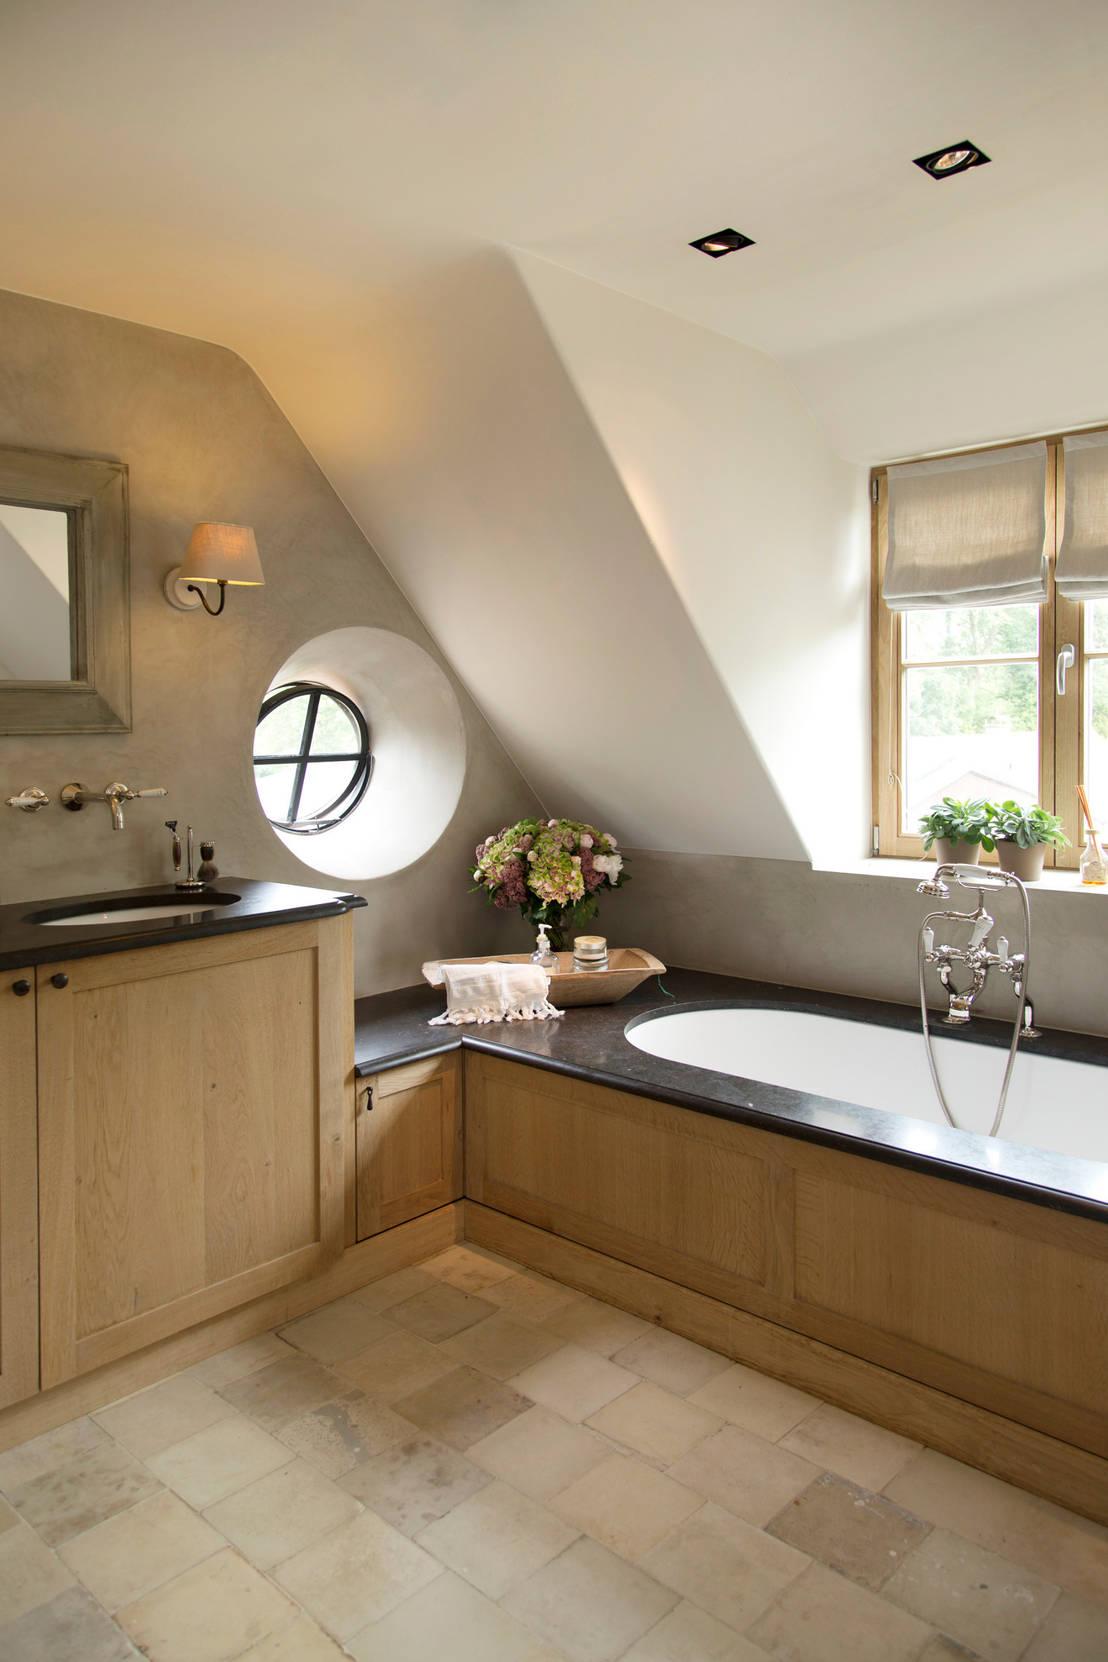 Kremer Keukens Tegels Sanitair C V : Modern landelijke badkamers door Taps&Baths homify